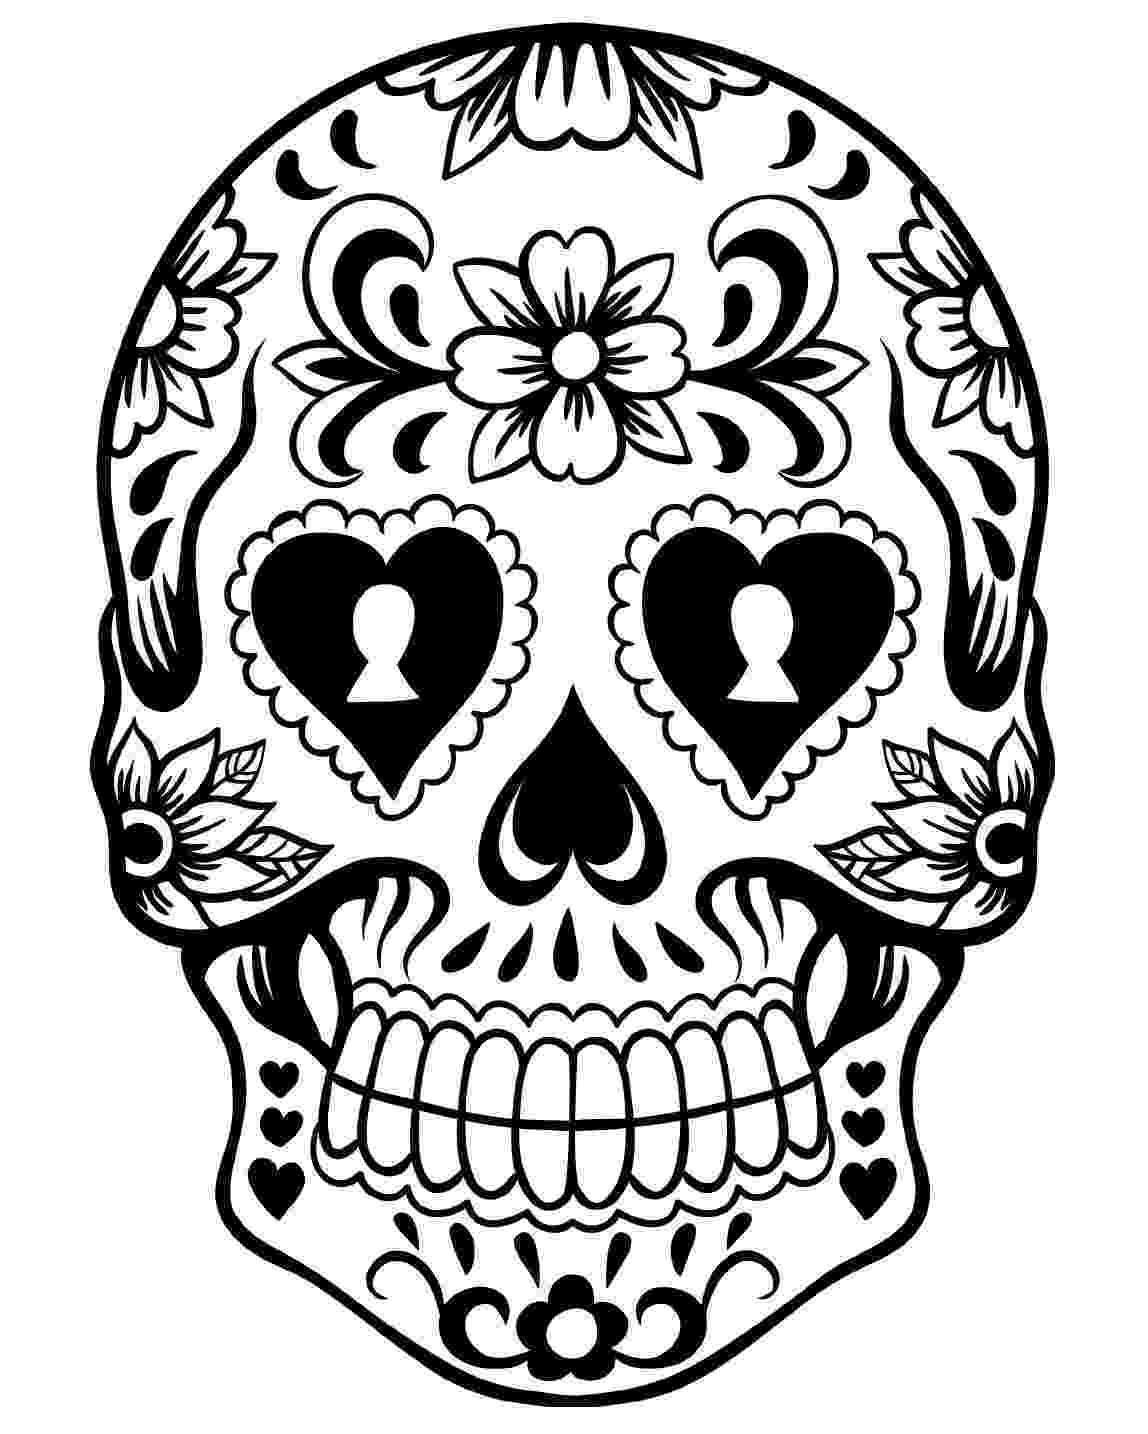 skull coloring sheets skull graffiti coloring pages coloring home skull sheets coloring